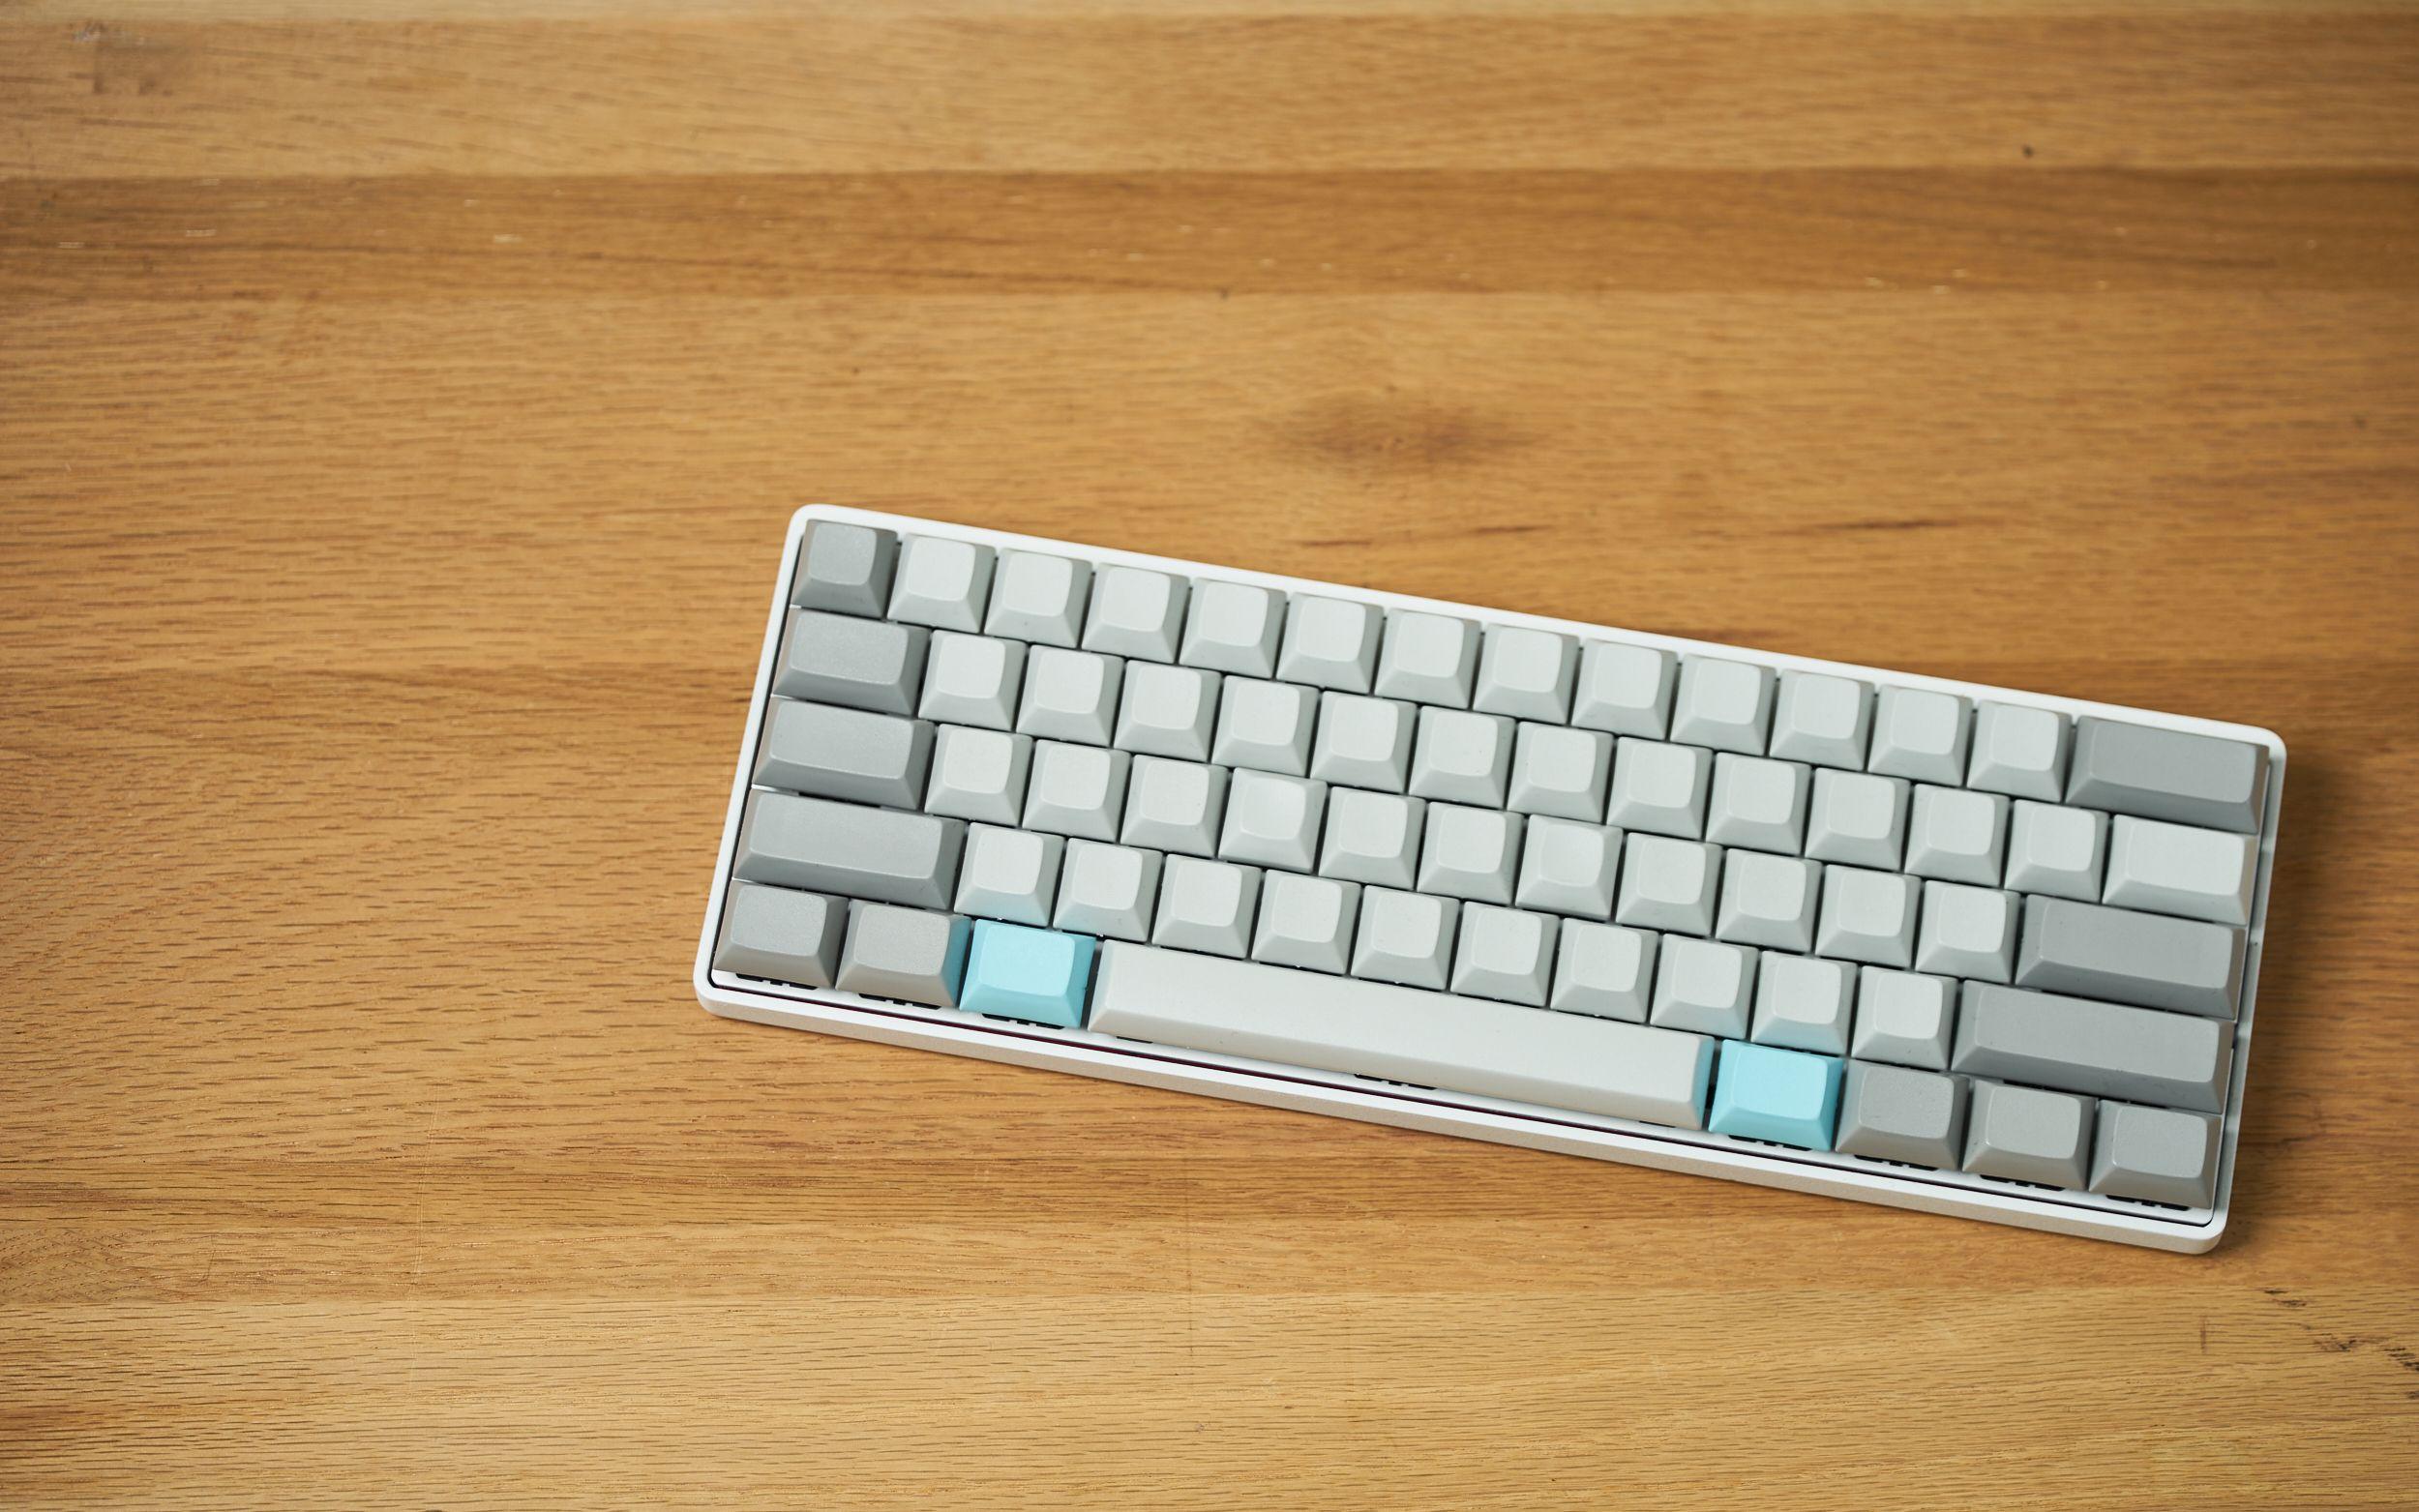 Blank Pok3r In 2020 Computer Keyboard Keyboard Artisan